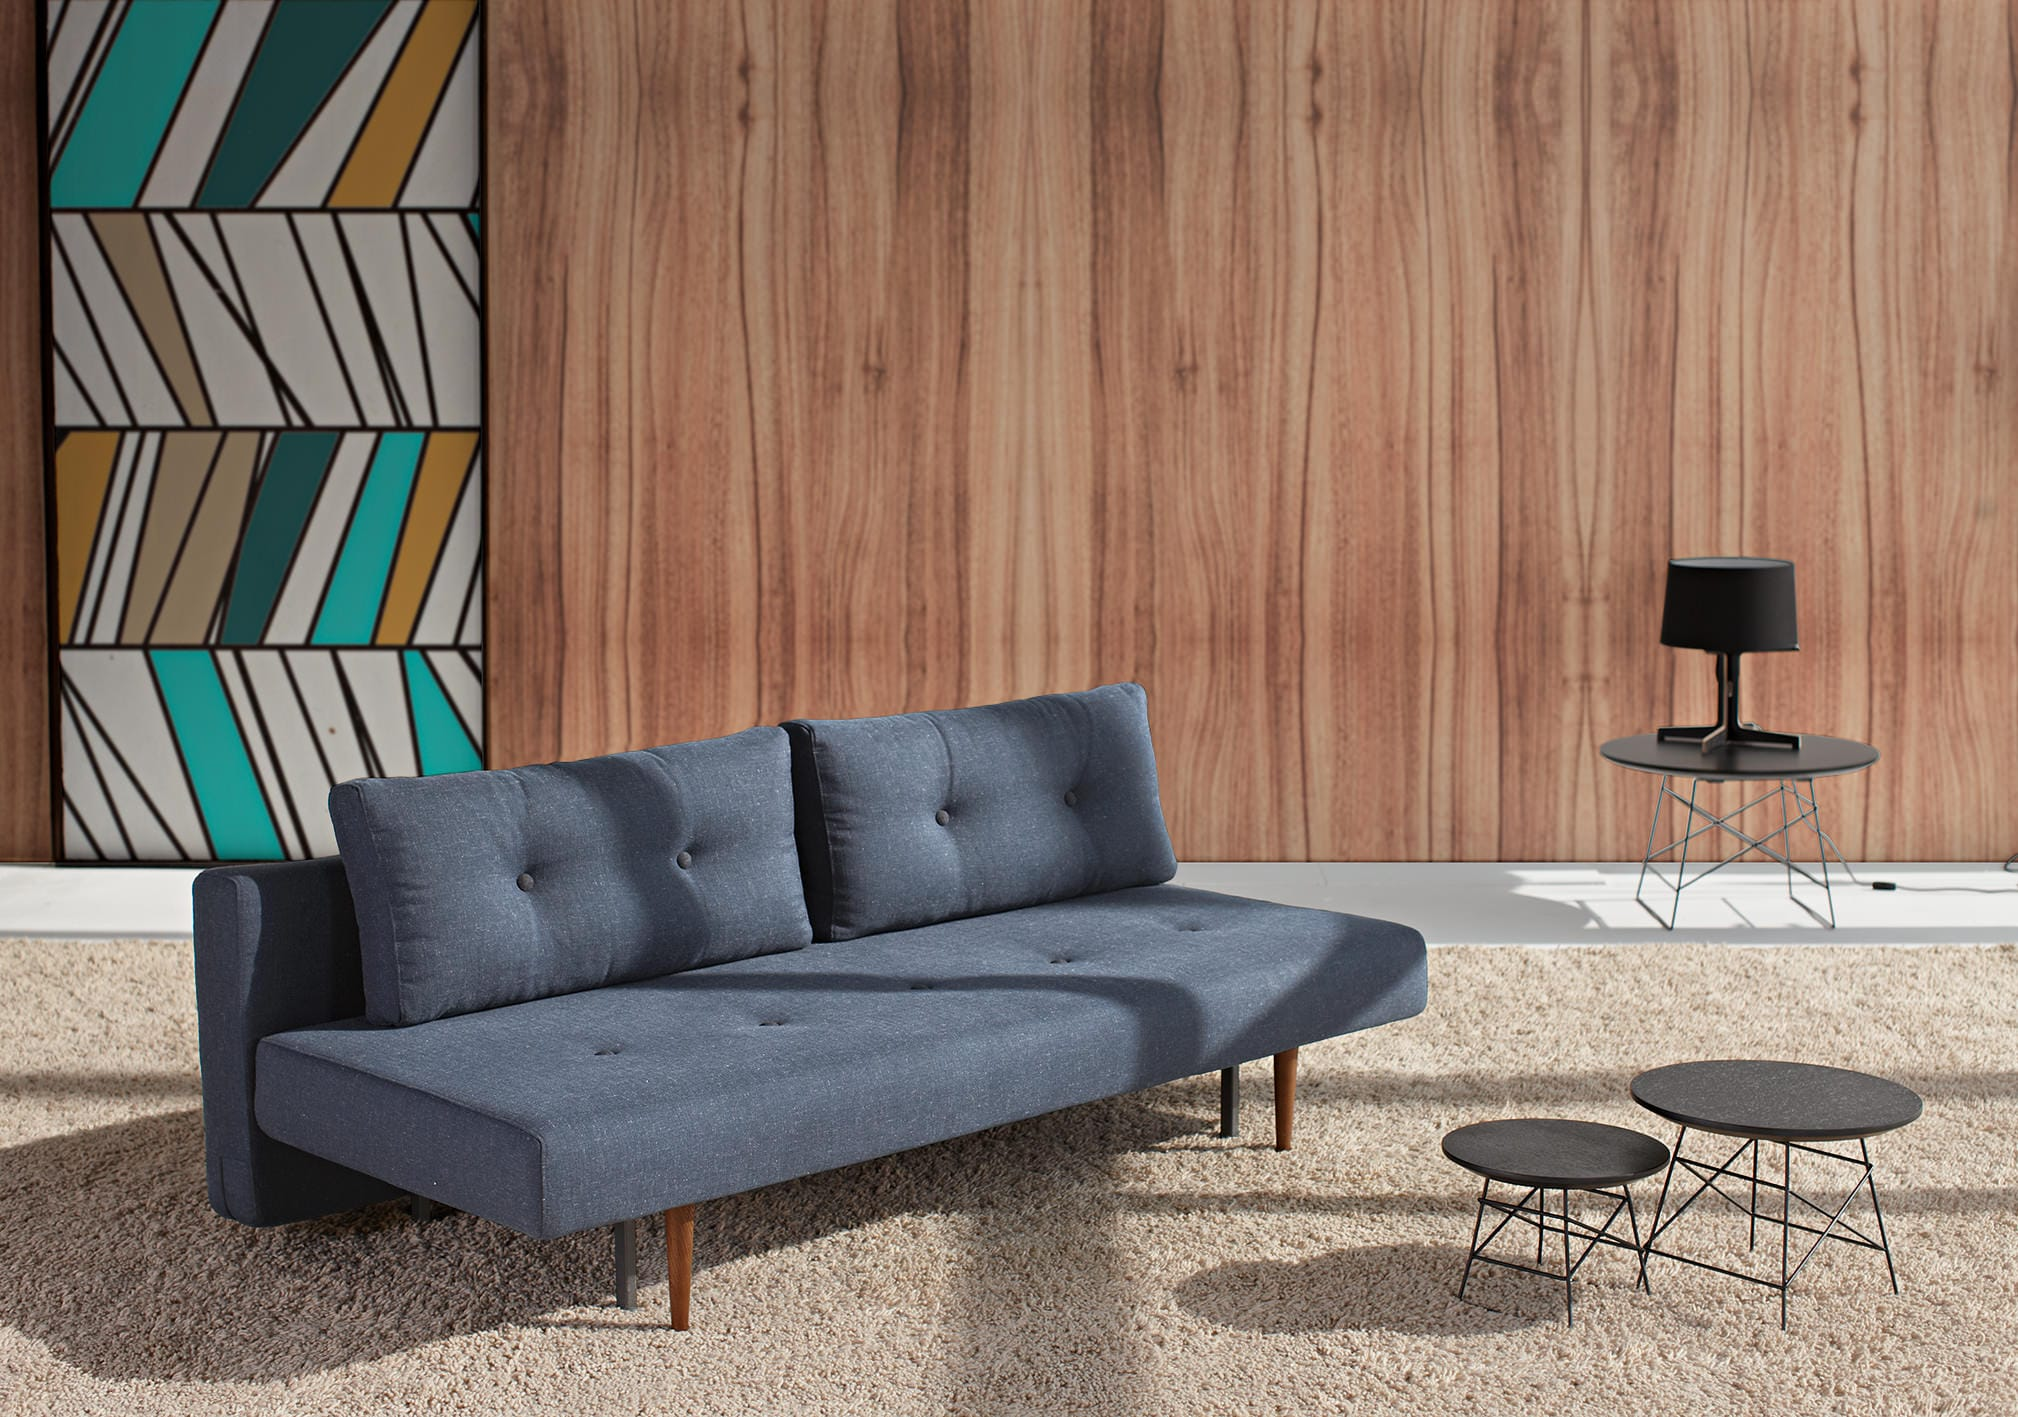 Recast Sofa Bed (Full Size) Nist Blue By Innovation (Innovation USA)